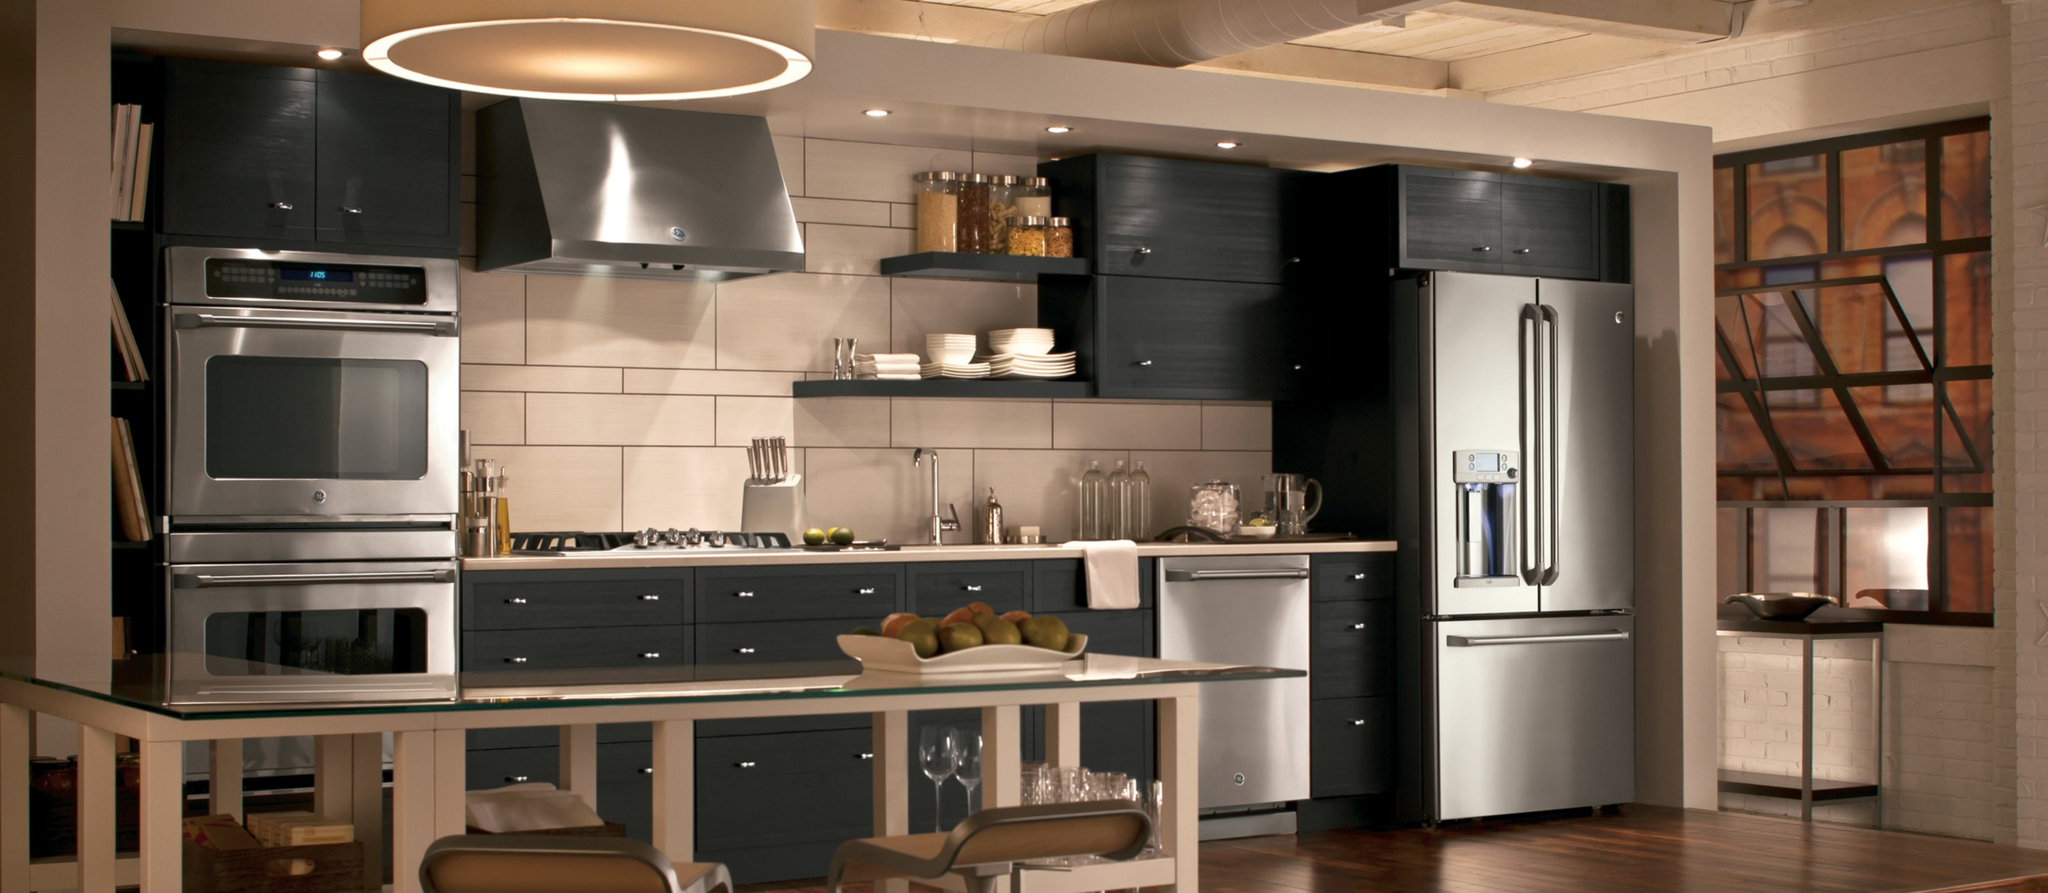 Chediac Furniture & Appliances Ltd